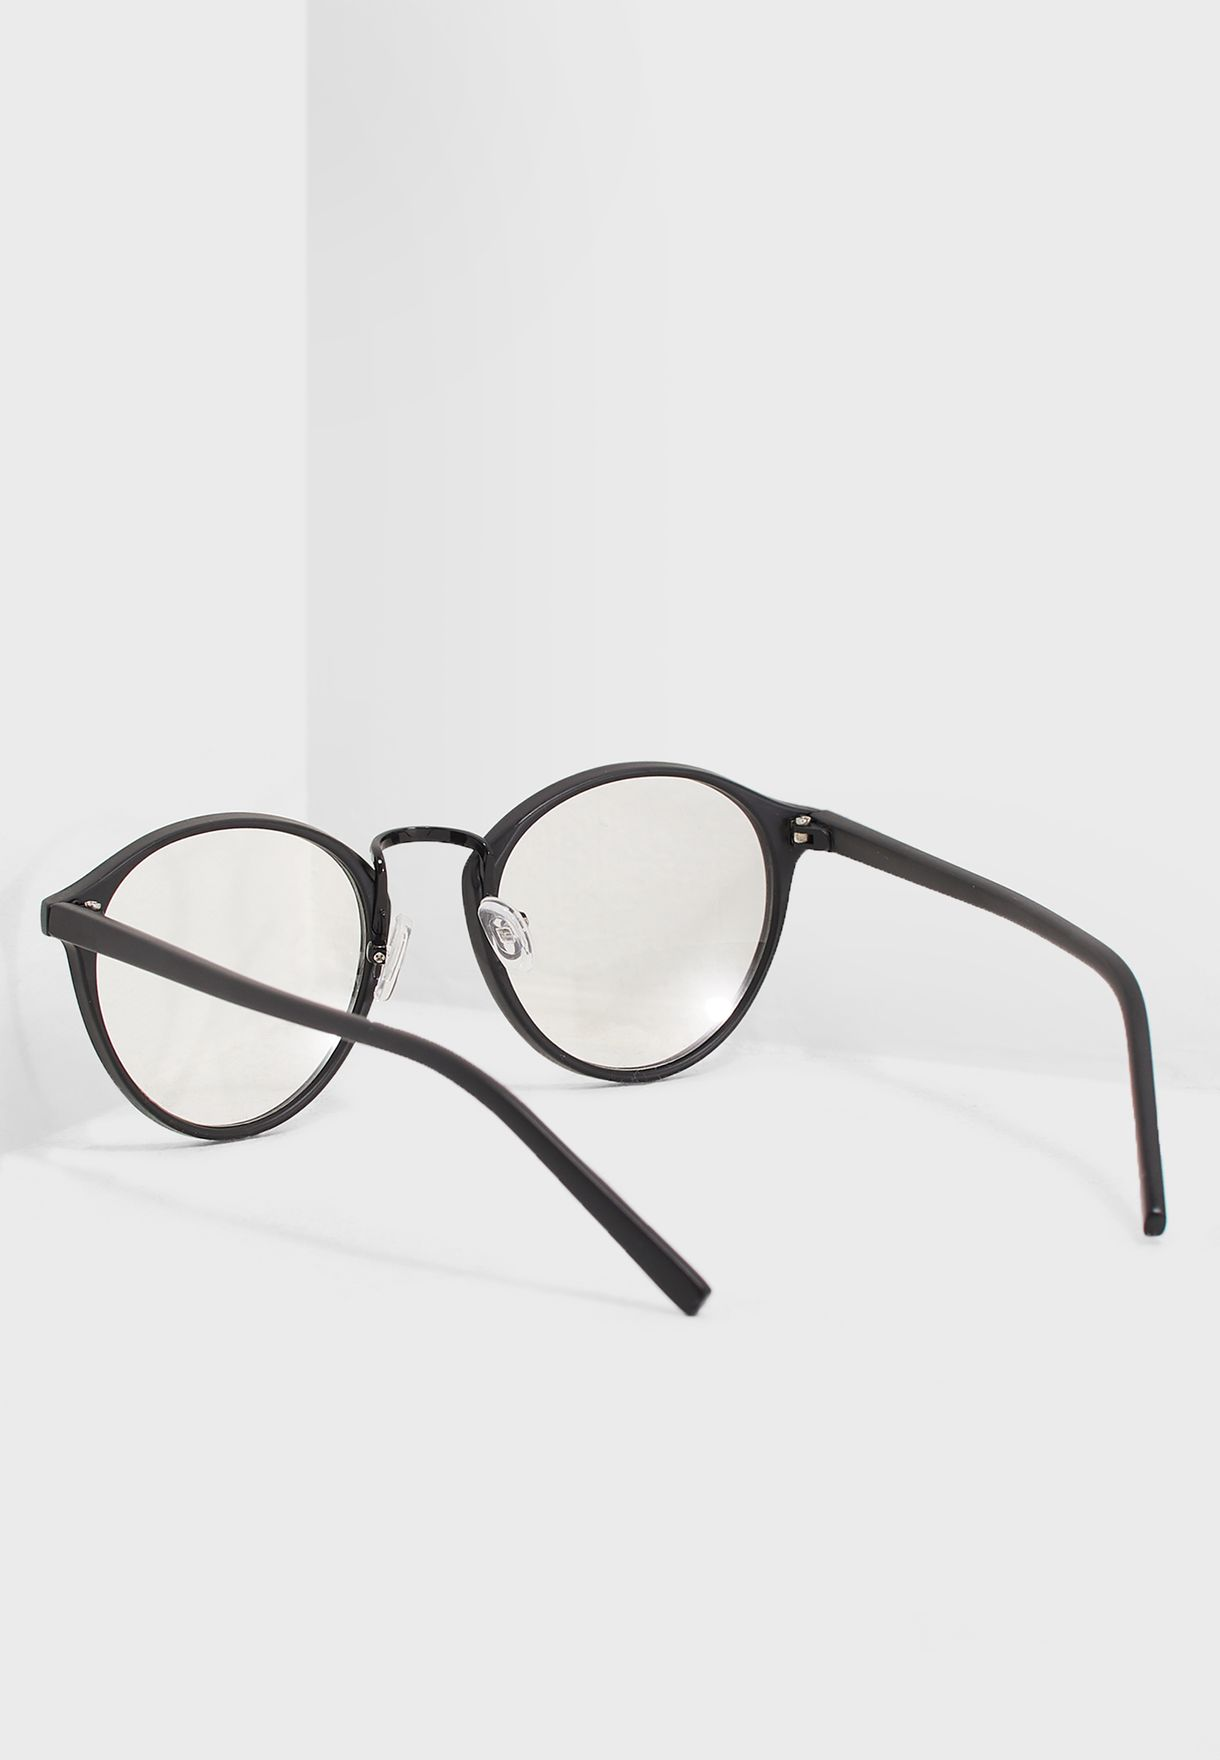 10cc1d3d45 Shop Ginger black Clear Lens Round Glasses 1850 for Women in UAE ...